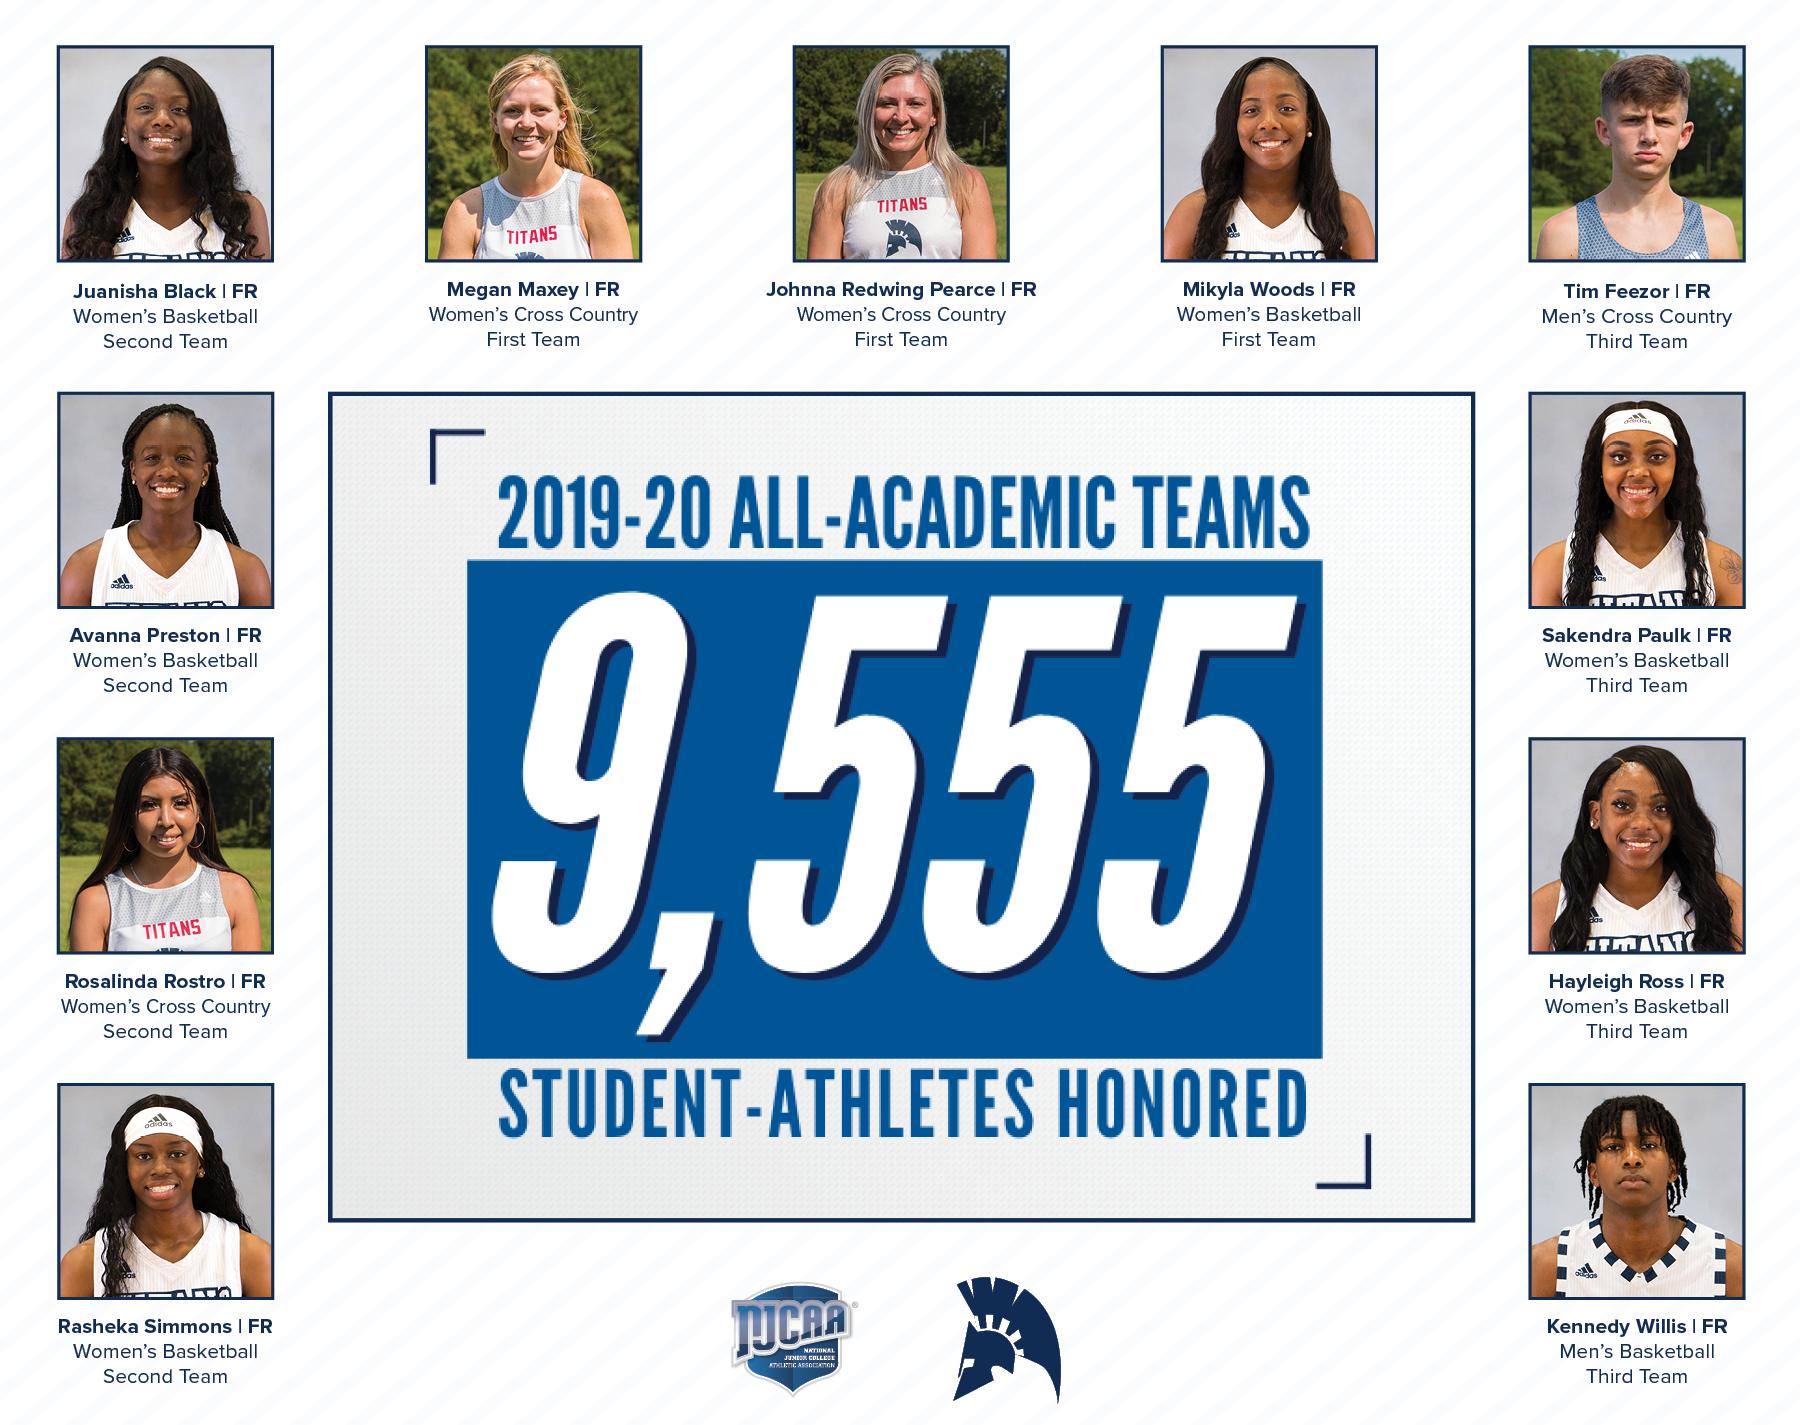 njcaa-all-academic-team-2019-20